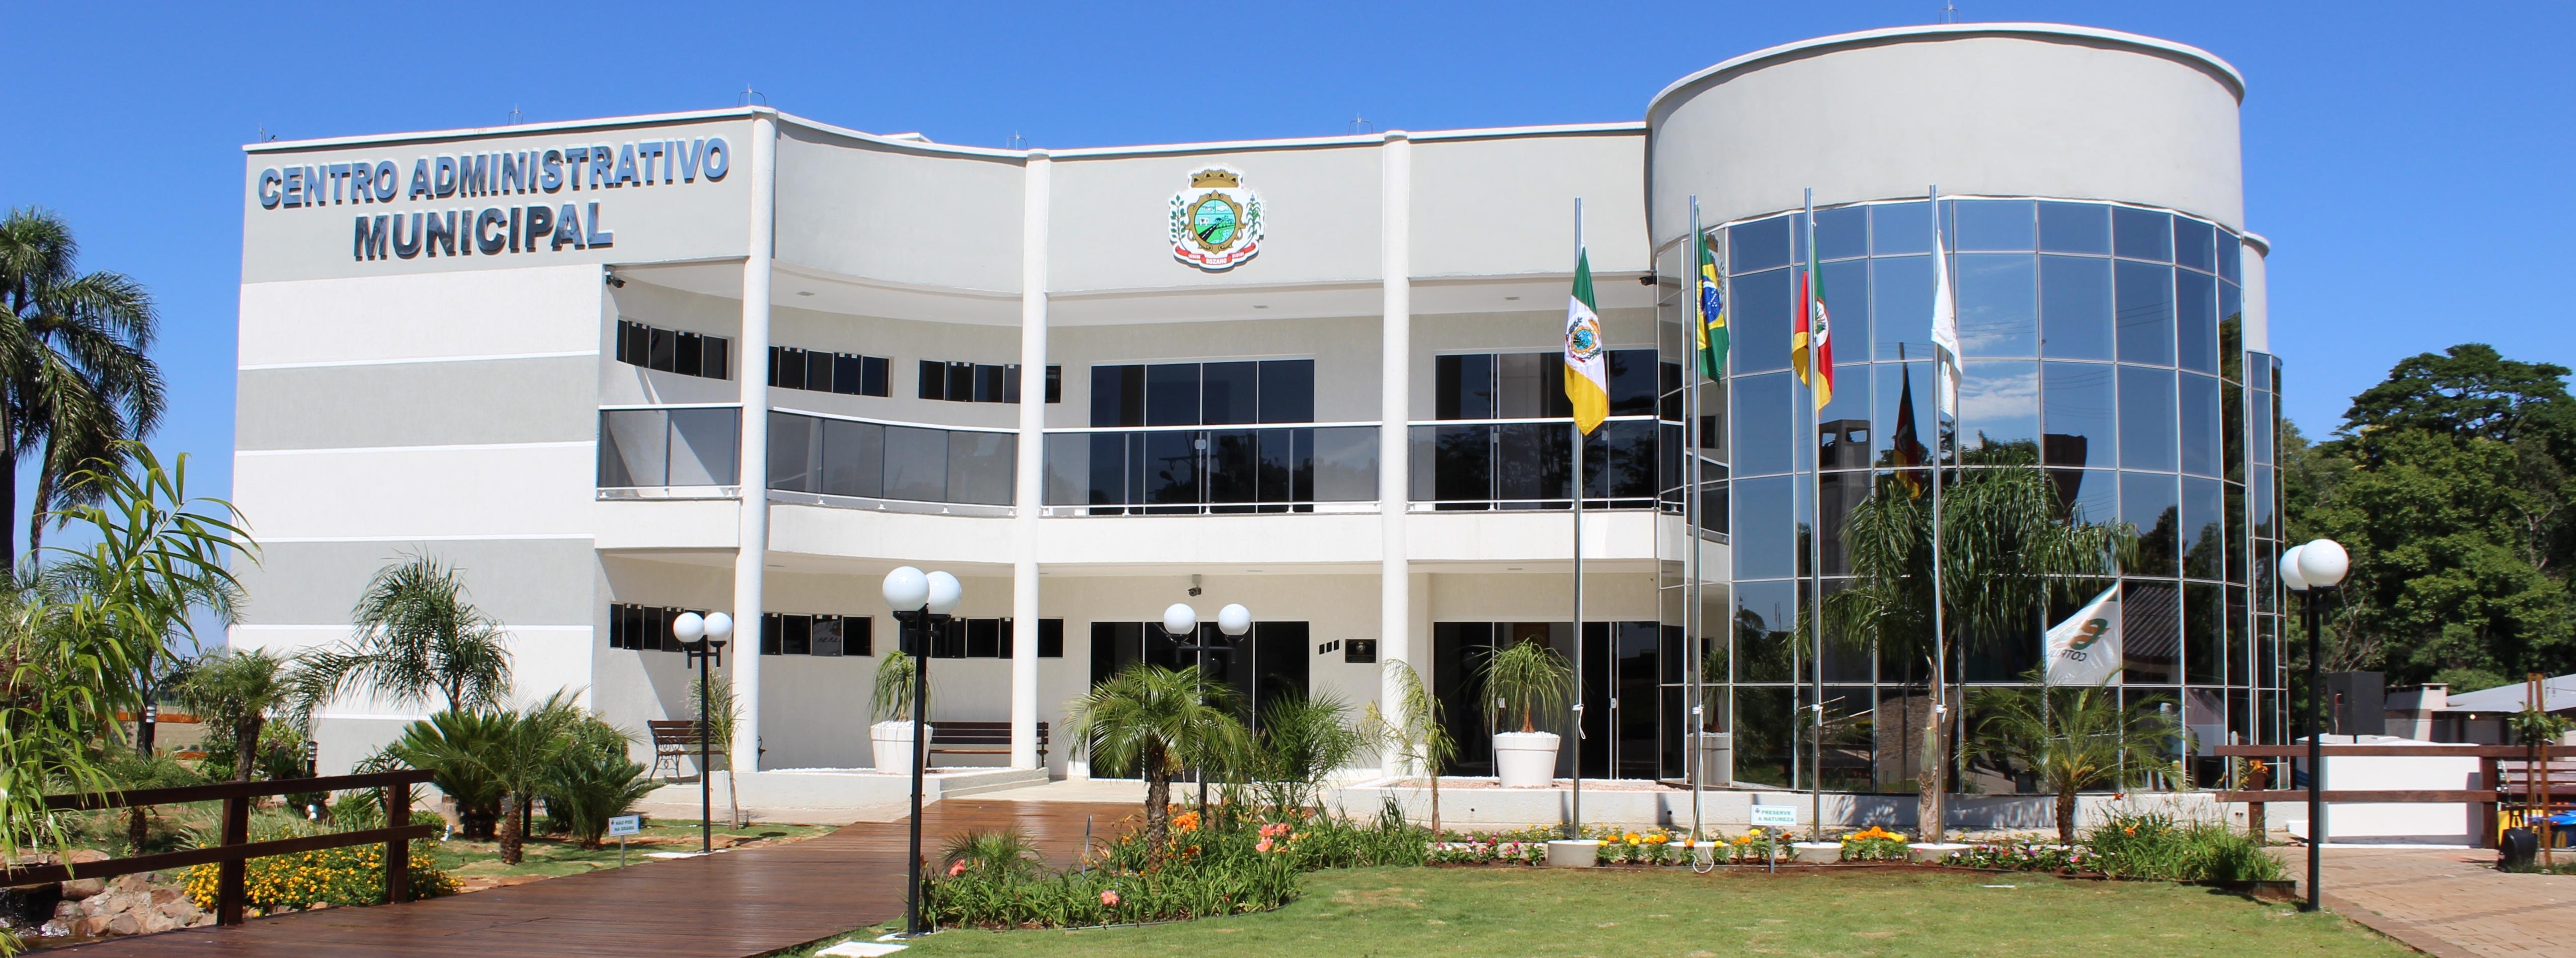 Fonte: www.radioprogresso.com.br